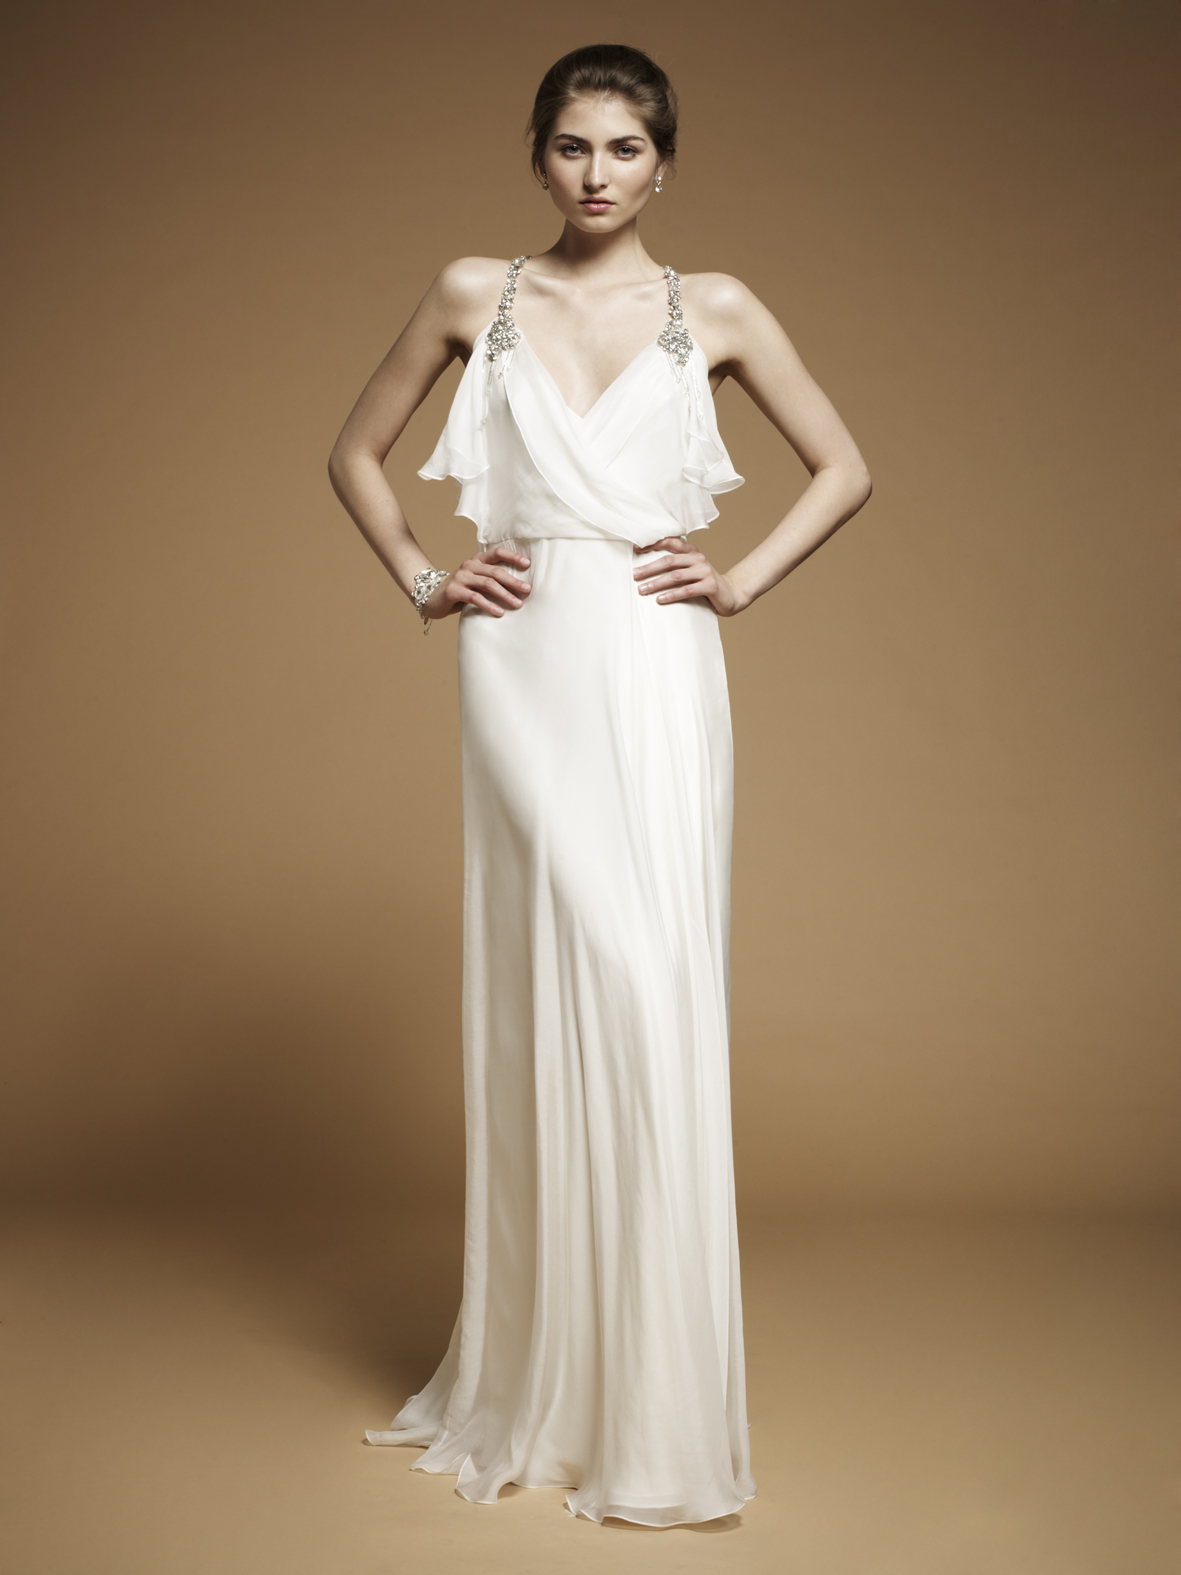 The quintessentially bride blog dream lover jenny for Jenny packham wedding dress